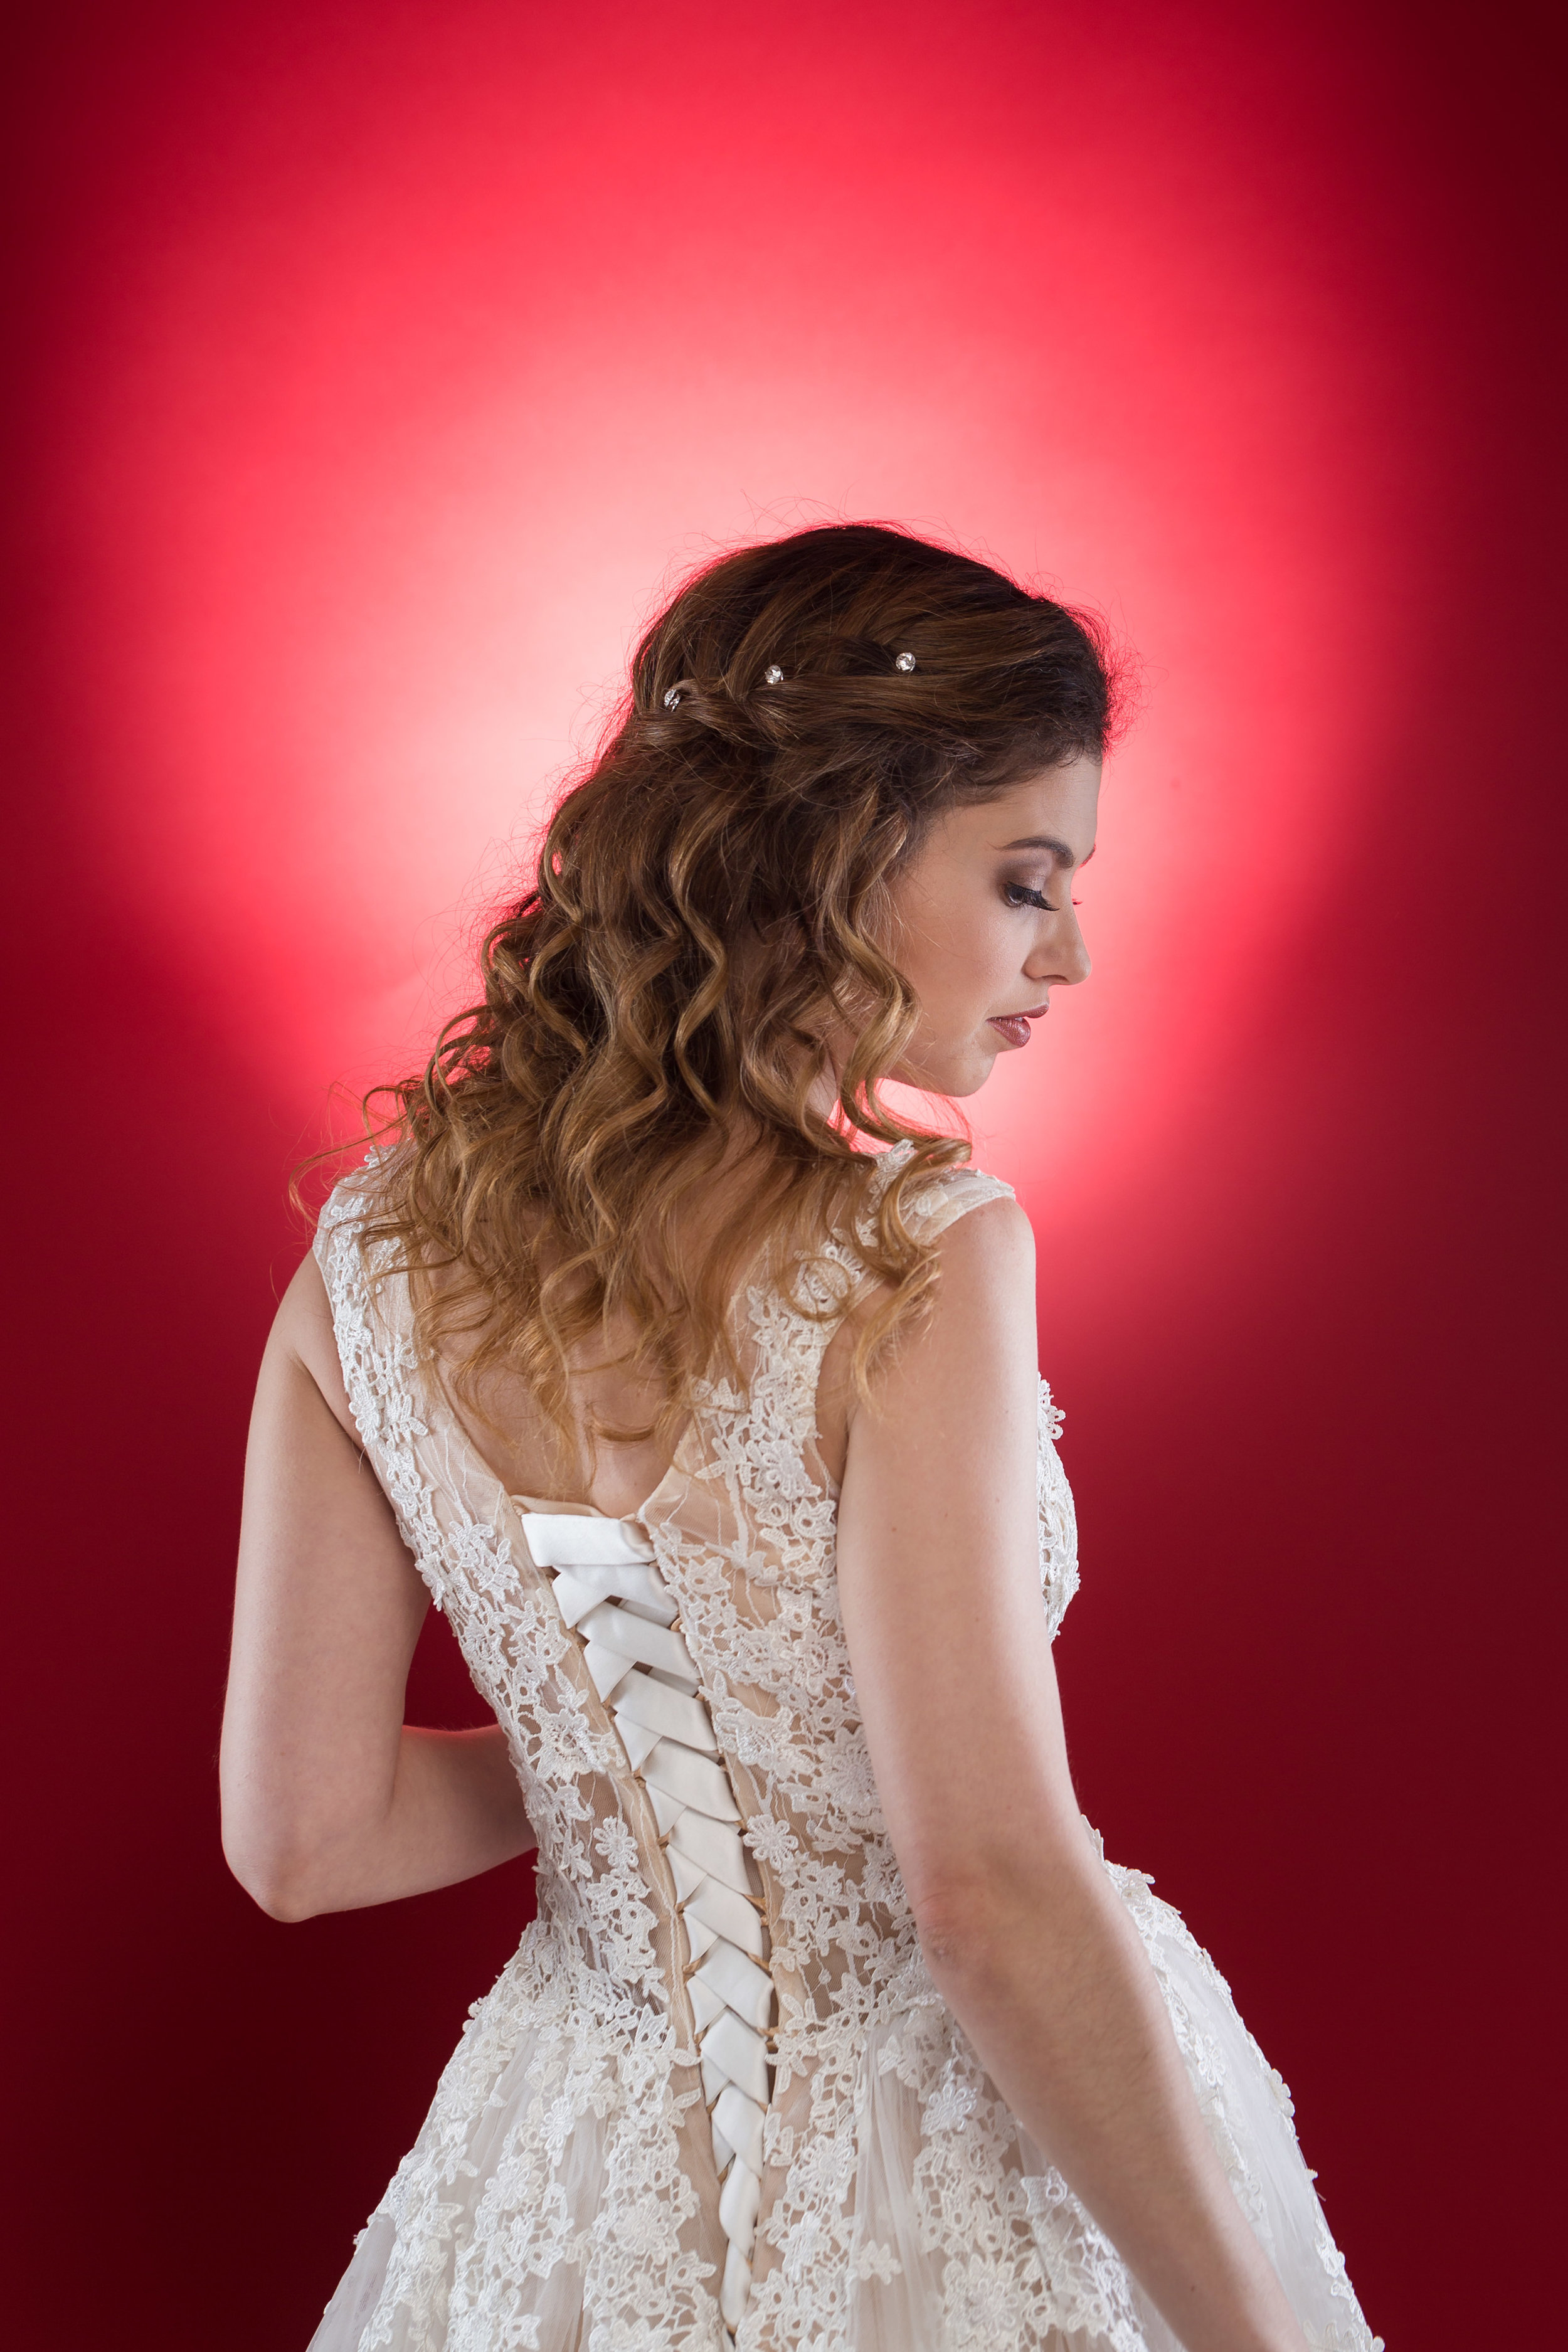 JVaughn_Photography_Weddings_Huntley_Photographer_Professional_Wedding-6.jpg